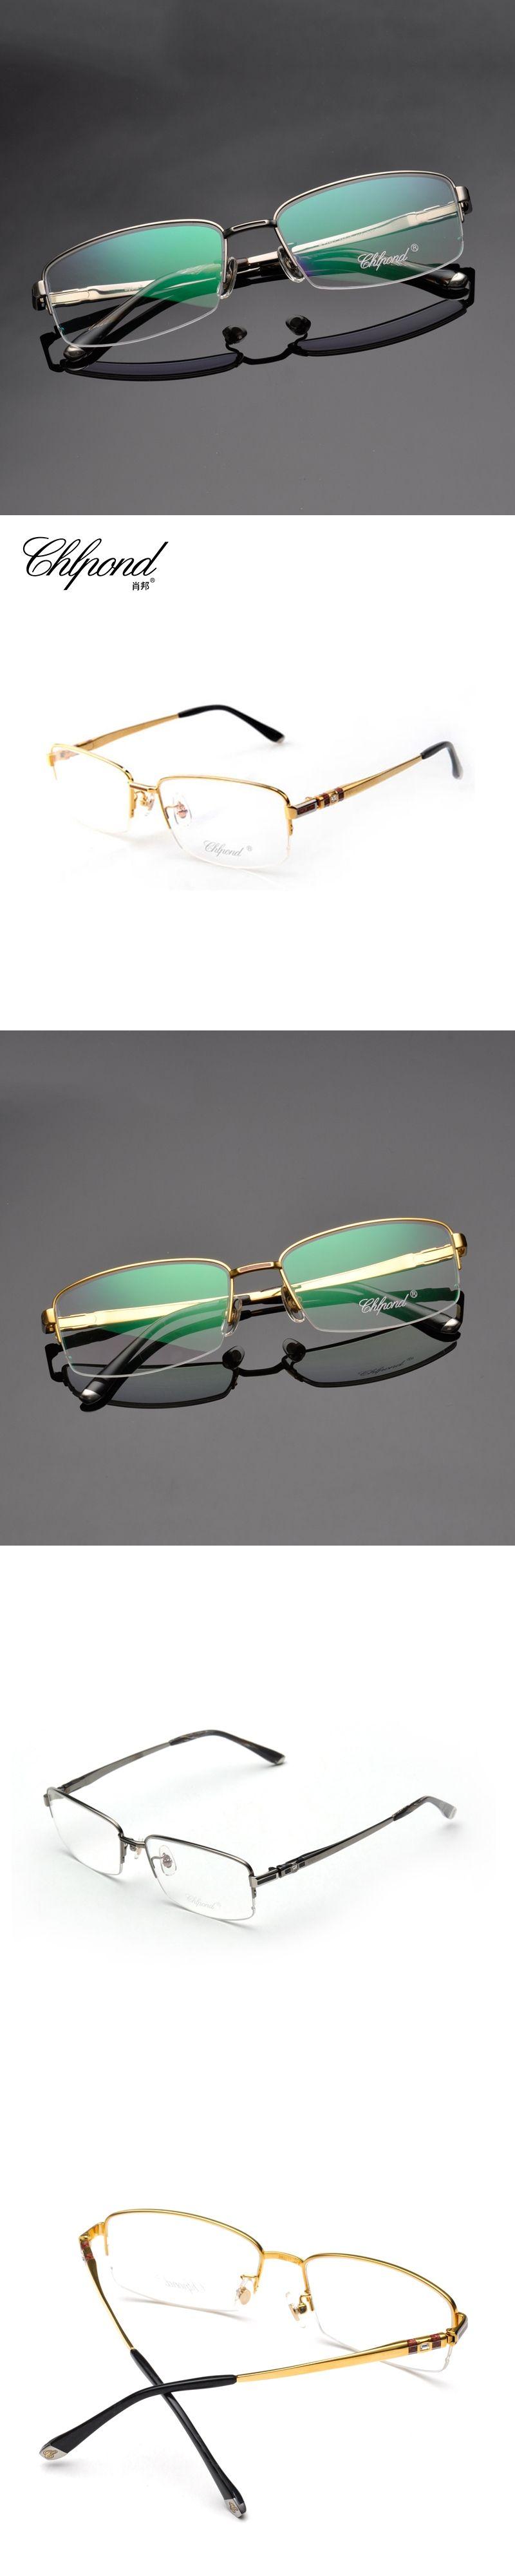 28efe1821a Chlpond Luxury 100% Pure Titanium Half Rim Brand Eyeglasses Men Optical  Spectacle Frame Eye Prescription